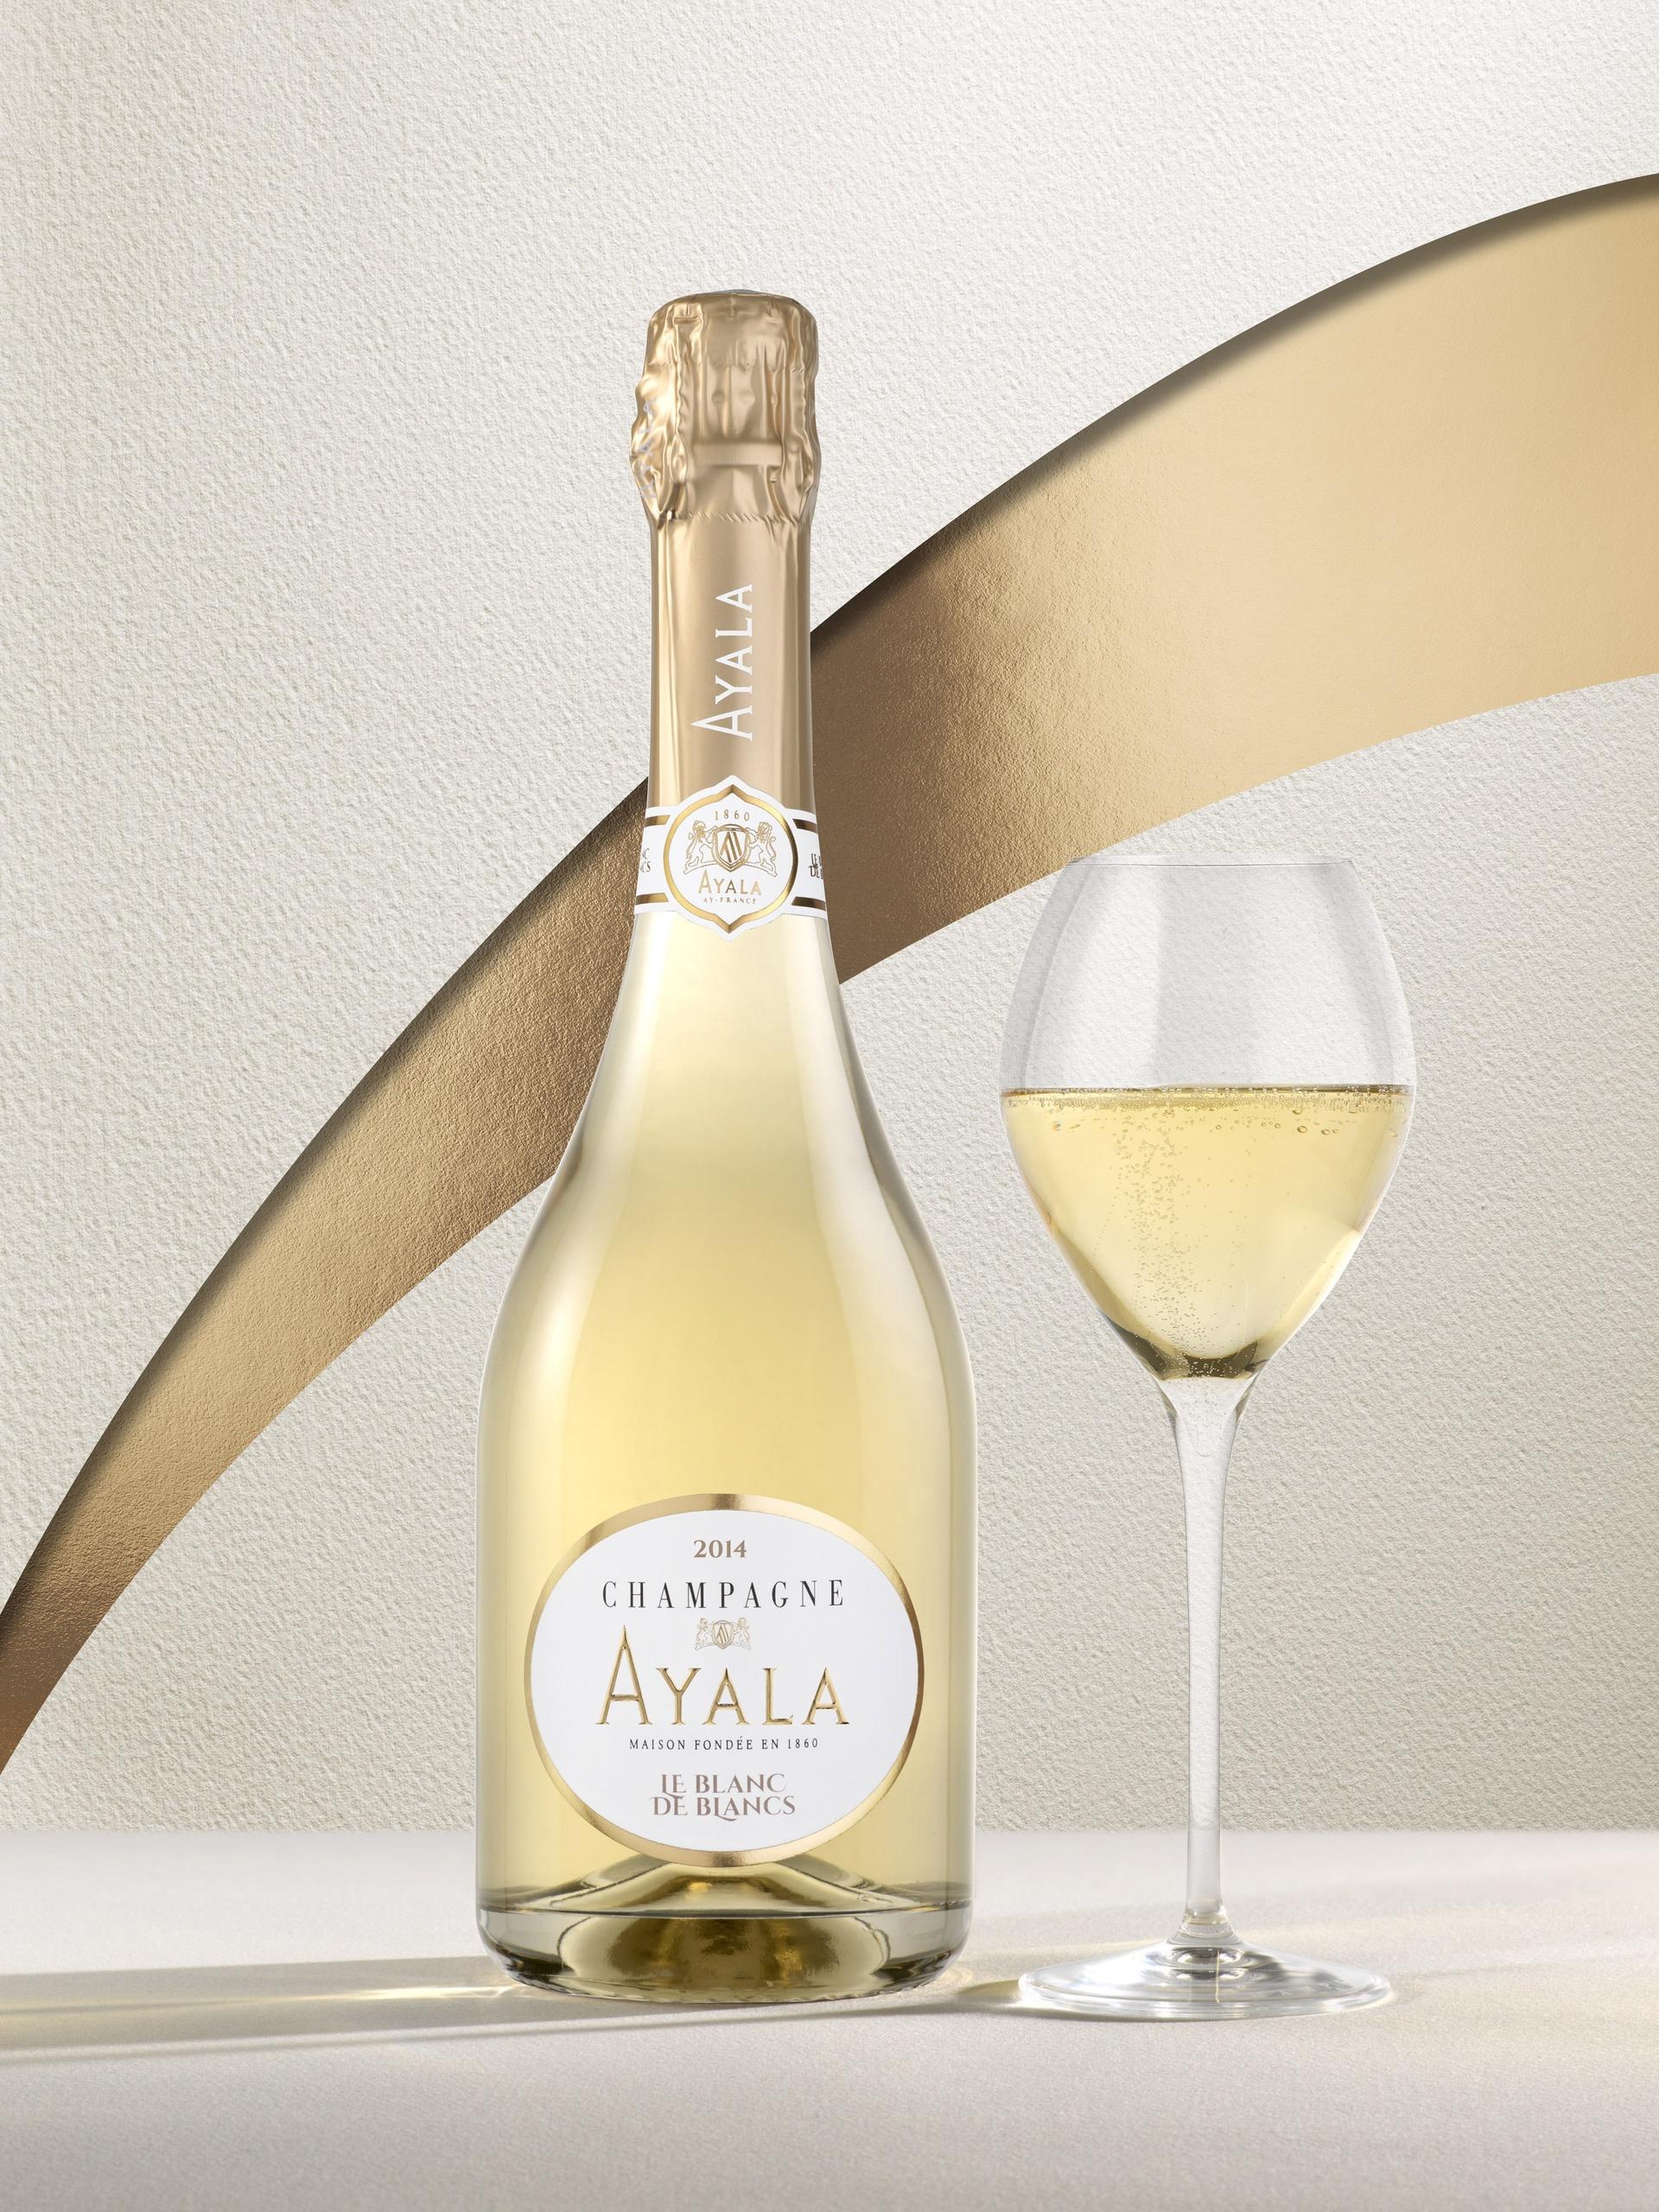 Le Blanc de Blancs 2014, new vintage - Champagne Ayala